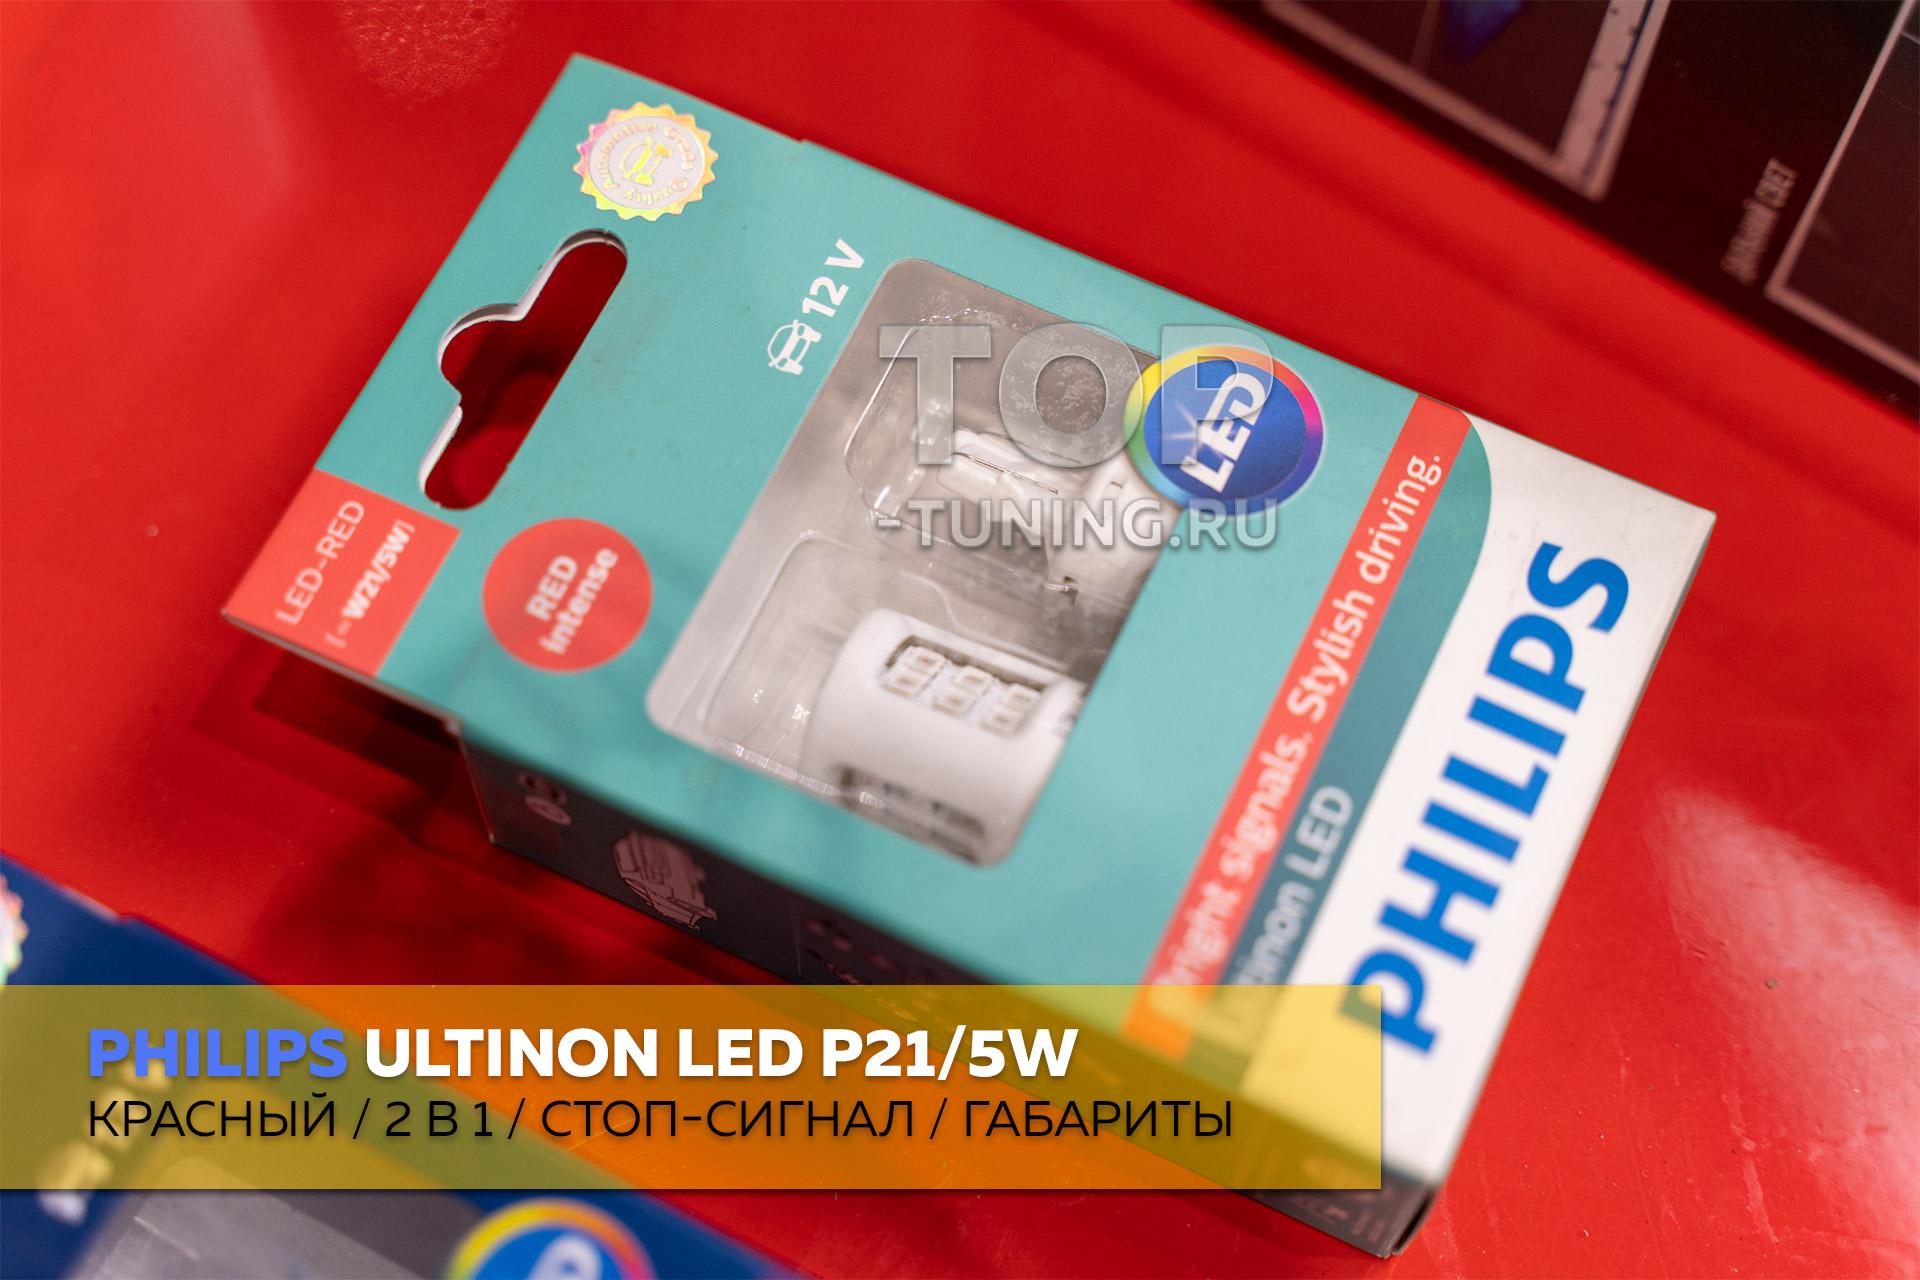 LED стоп-сигналы - Компоненты для тюнинга оптики Mitsubishi Pajero 4